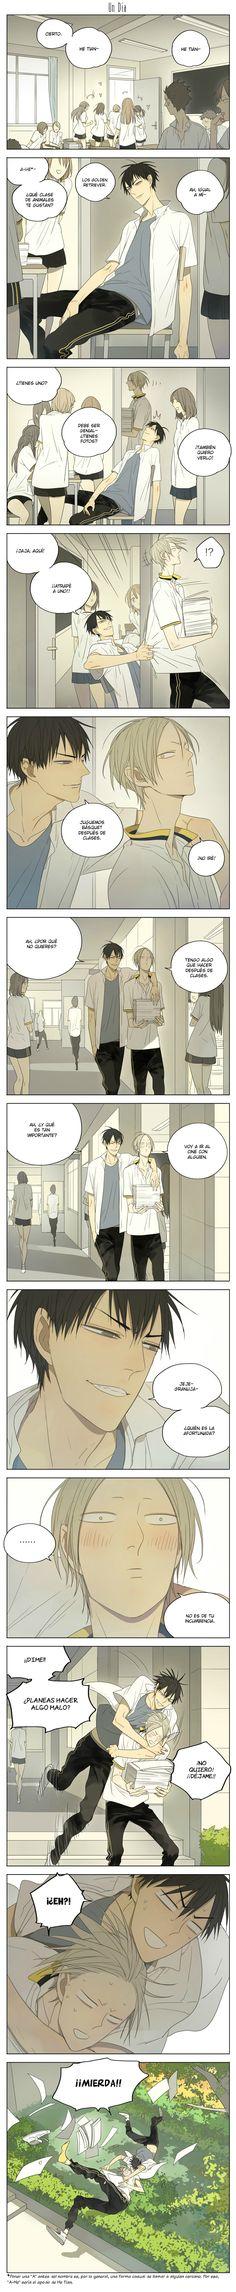 19 Days Capítulo 6 página 1 (Cargar imágenes: 10) - Leer Manga en Español gratis en NineManga.com